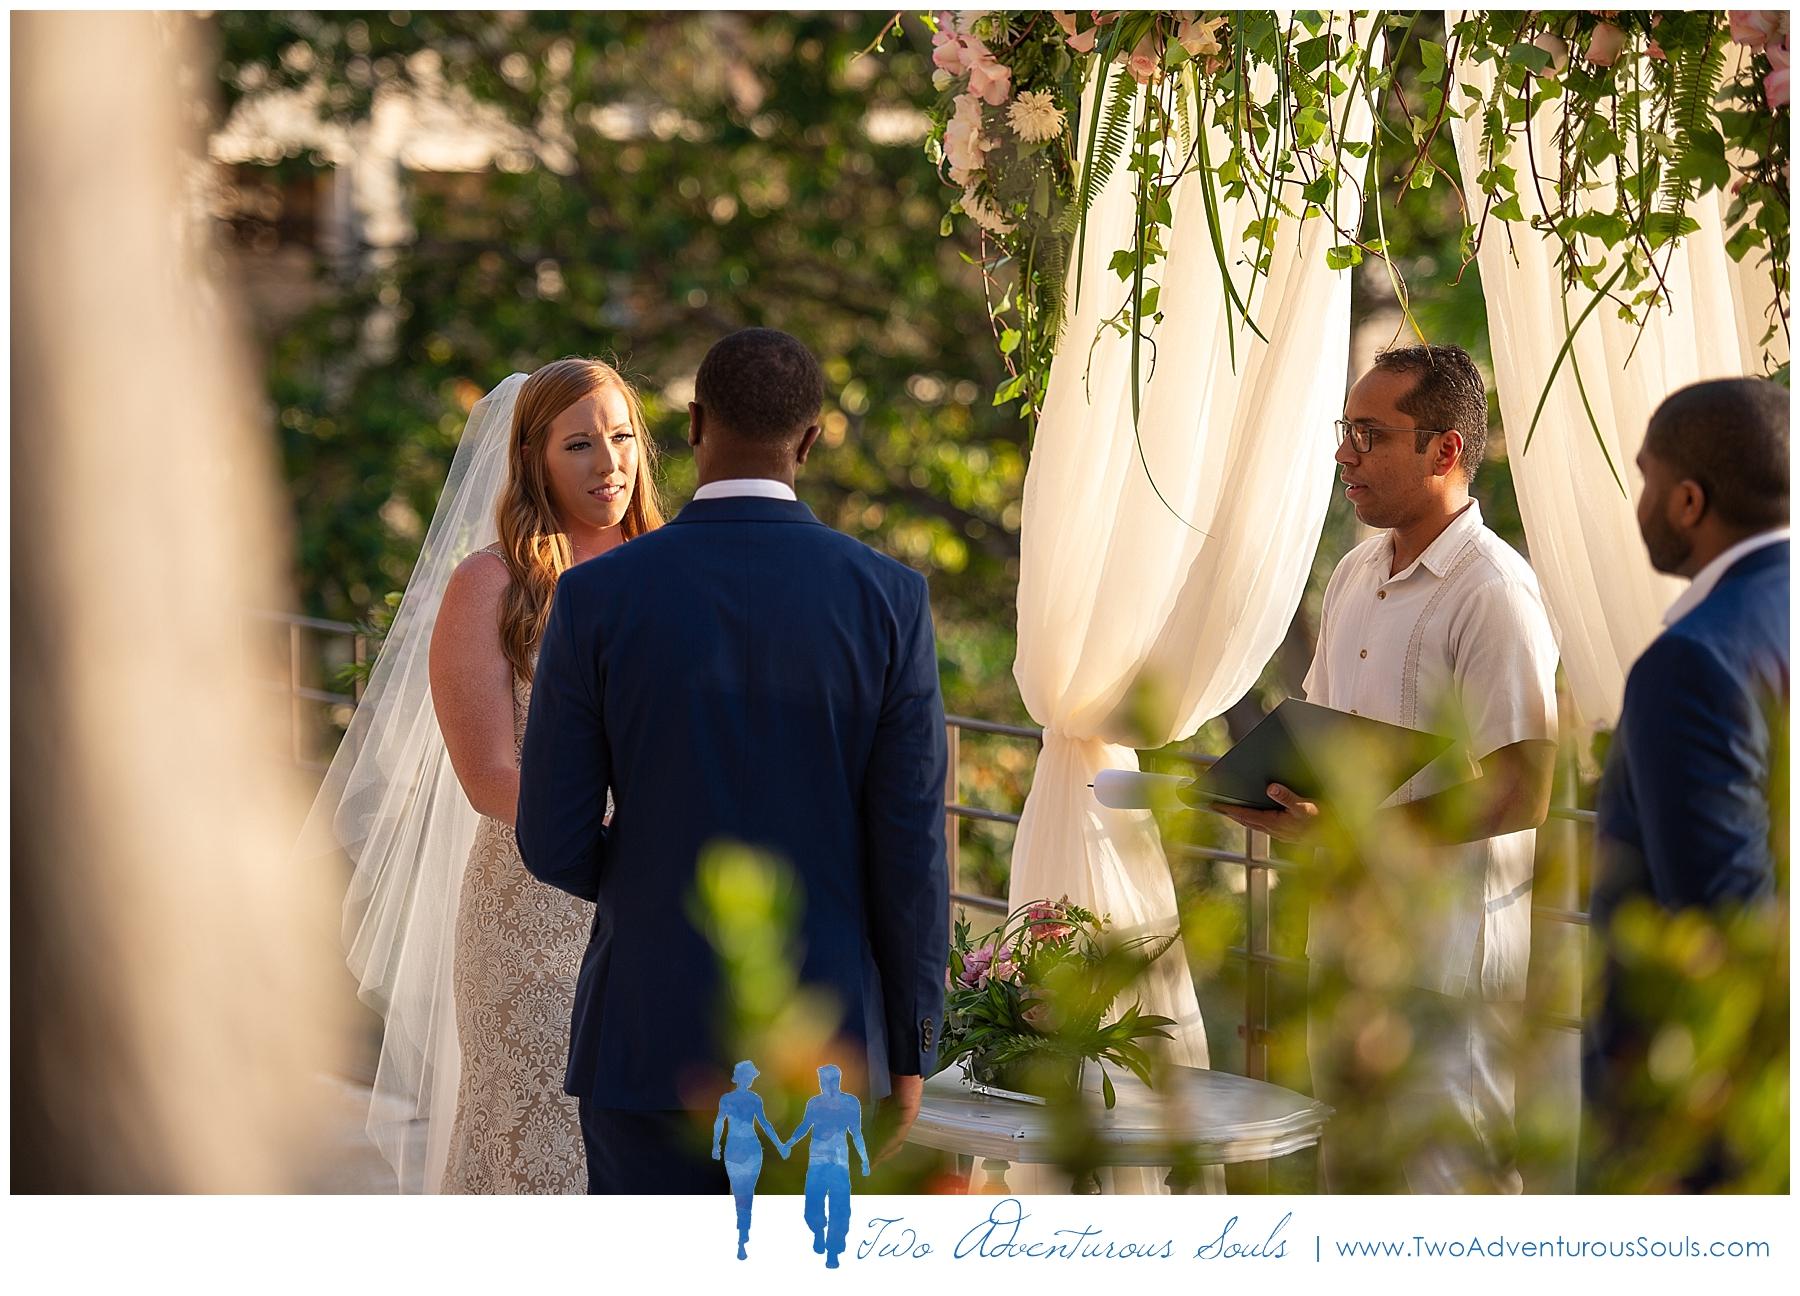 Costa Rica Wedding Photographers, Dreams las Mareas Wedding, Destination Wedding Photographers, Two Adventurous Souls - 022219_0023.jpg